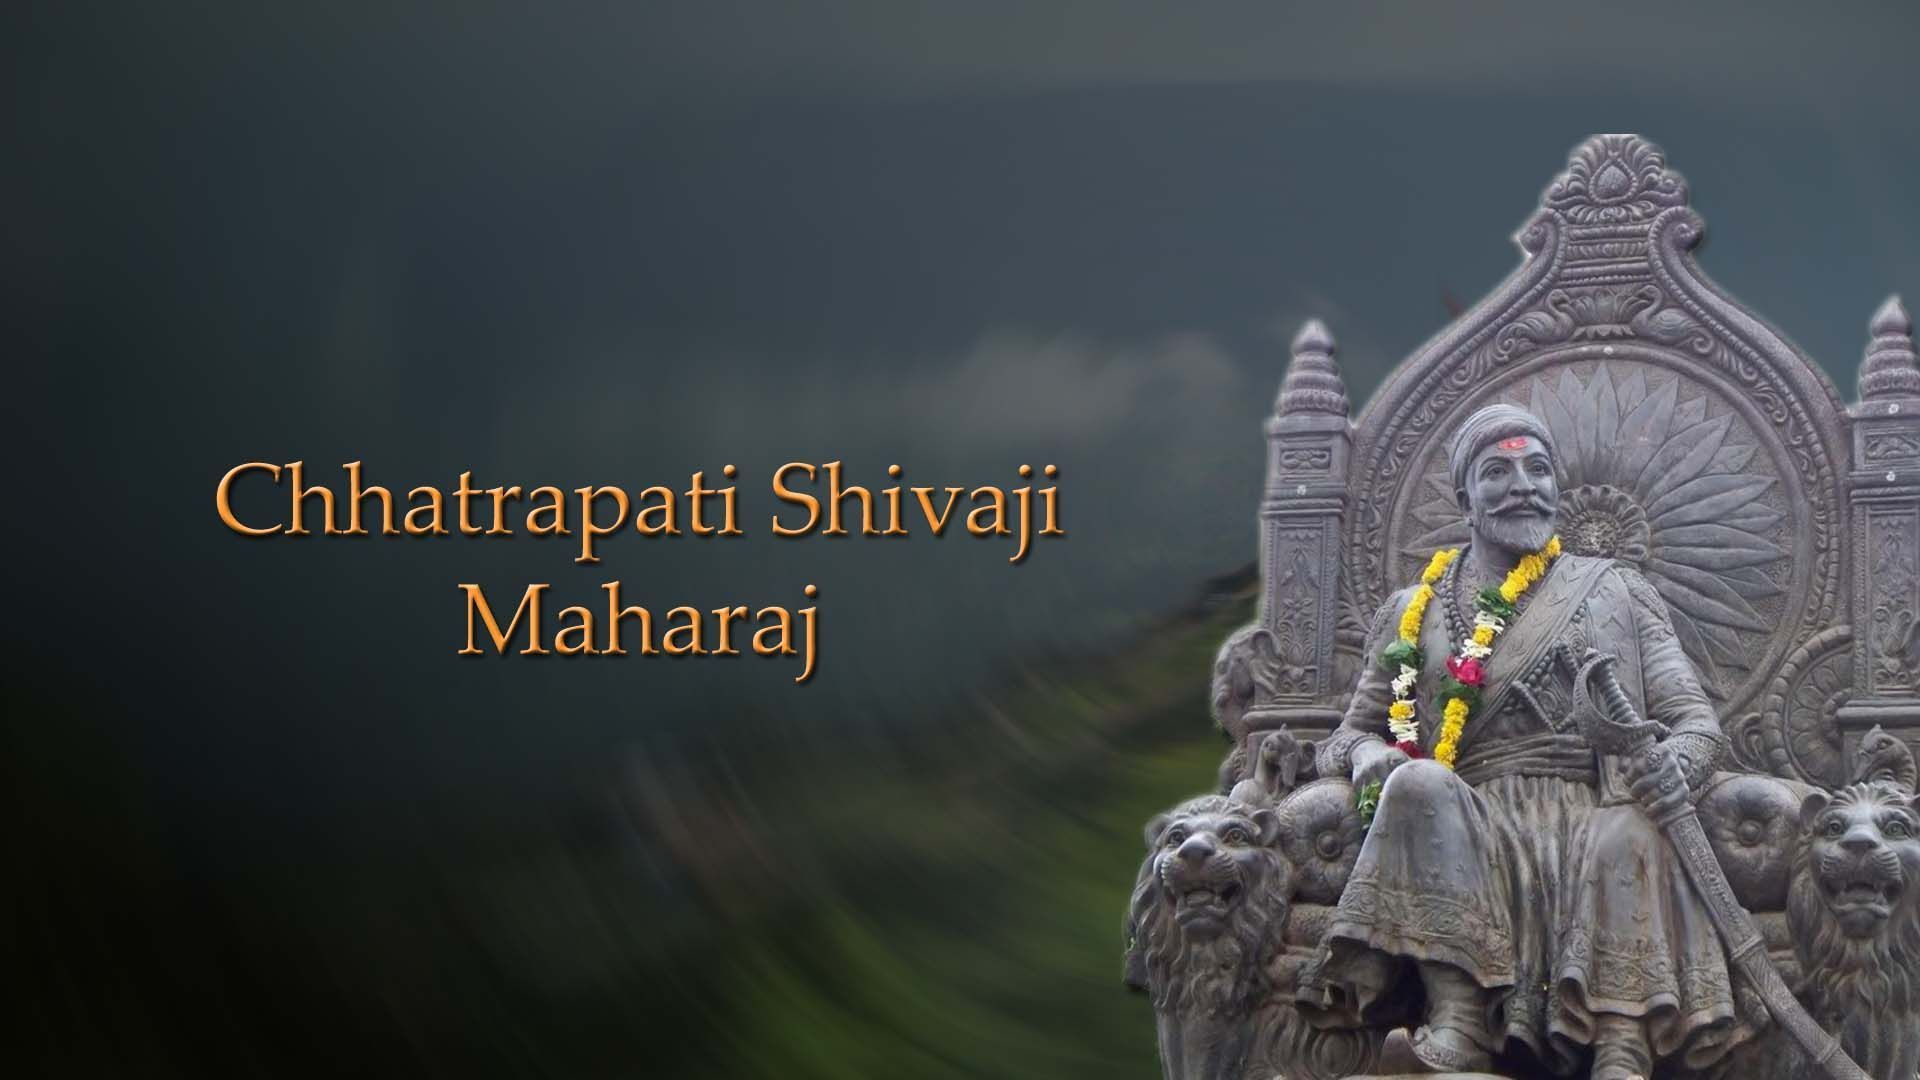 Shivaji Maharaj Wallpaper Hd Full Size 804042 History Wallpaper Shivaji Maharaj Wallpapers Desktop Wallpaper